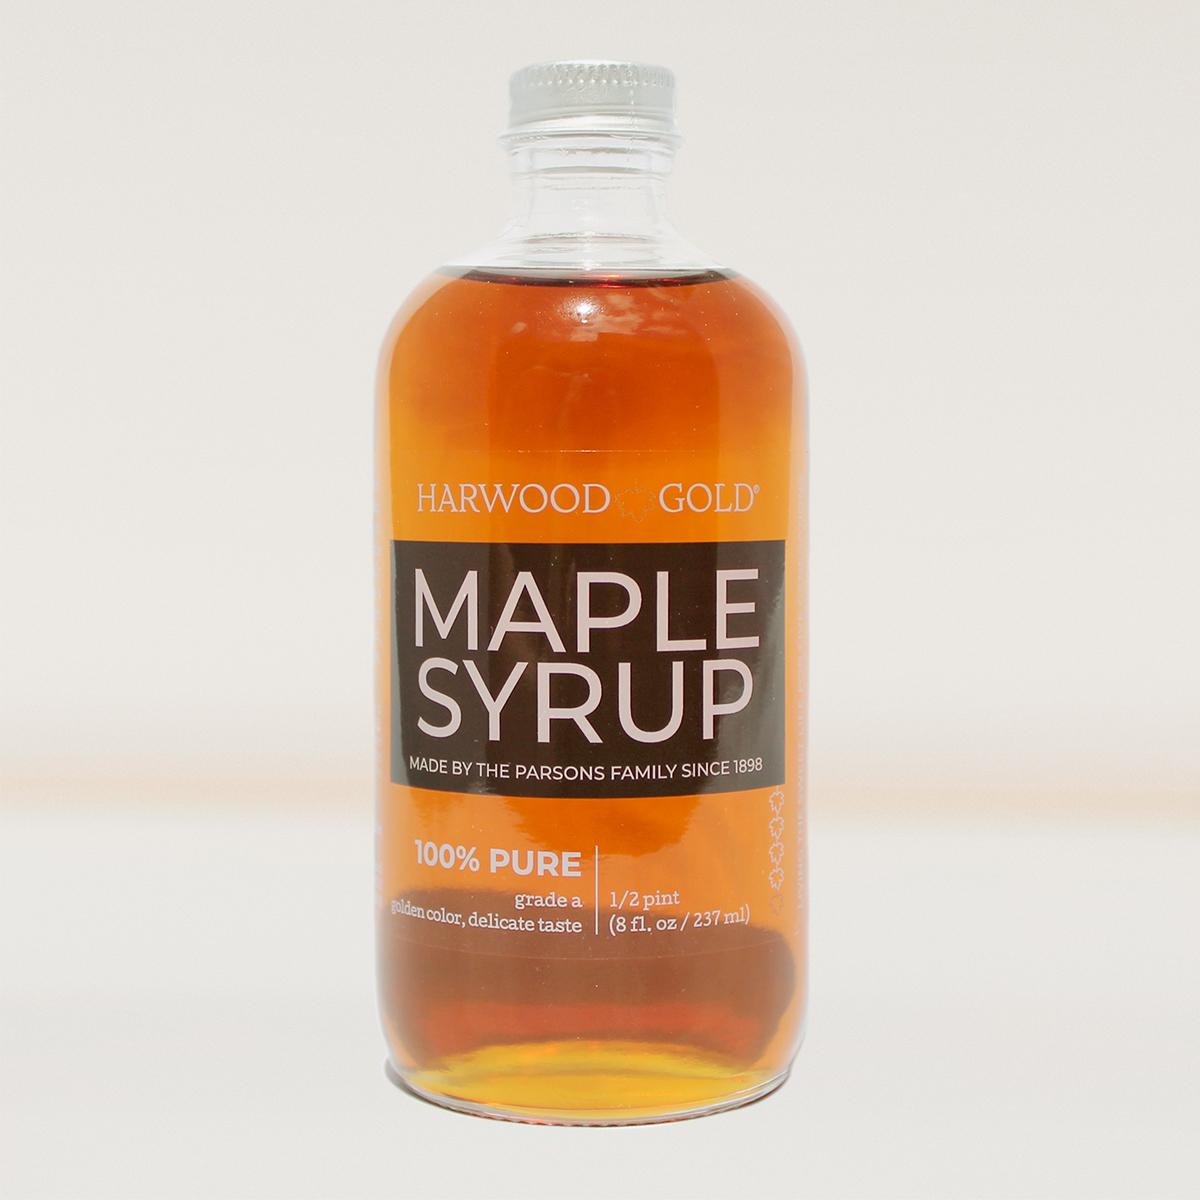 Harwood Gold Golden Maple Syrup